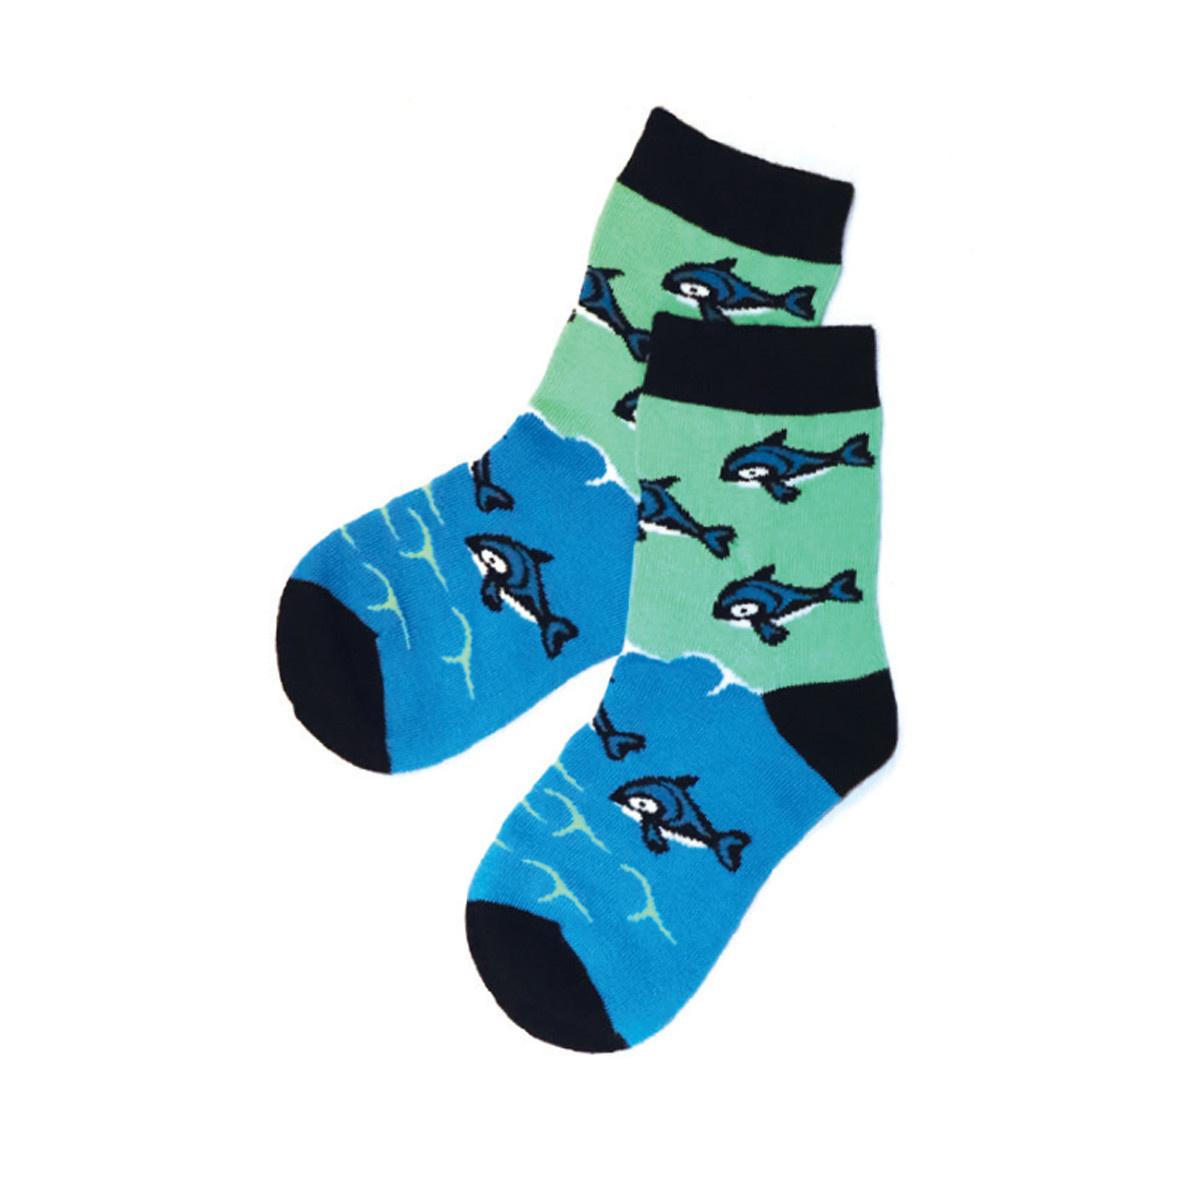 Kids Socks - Whale